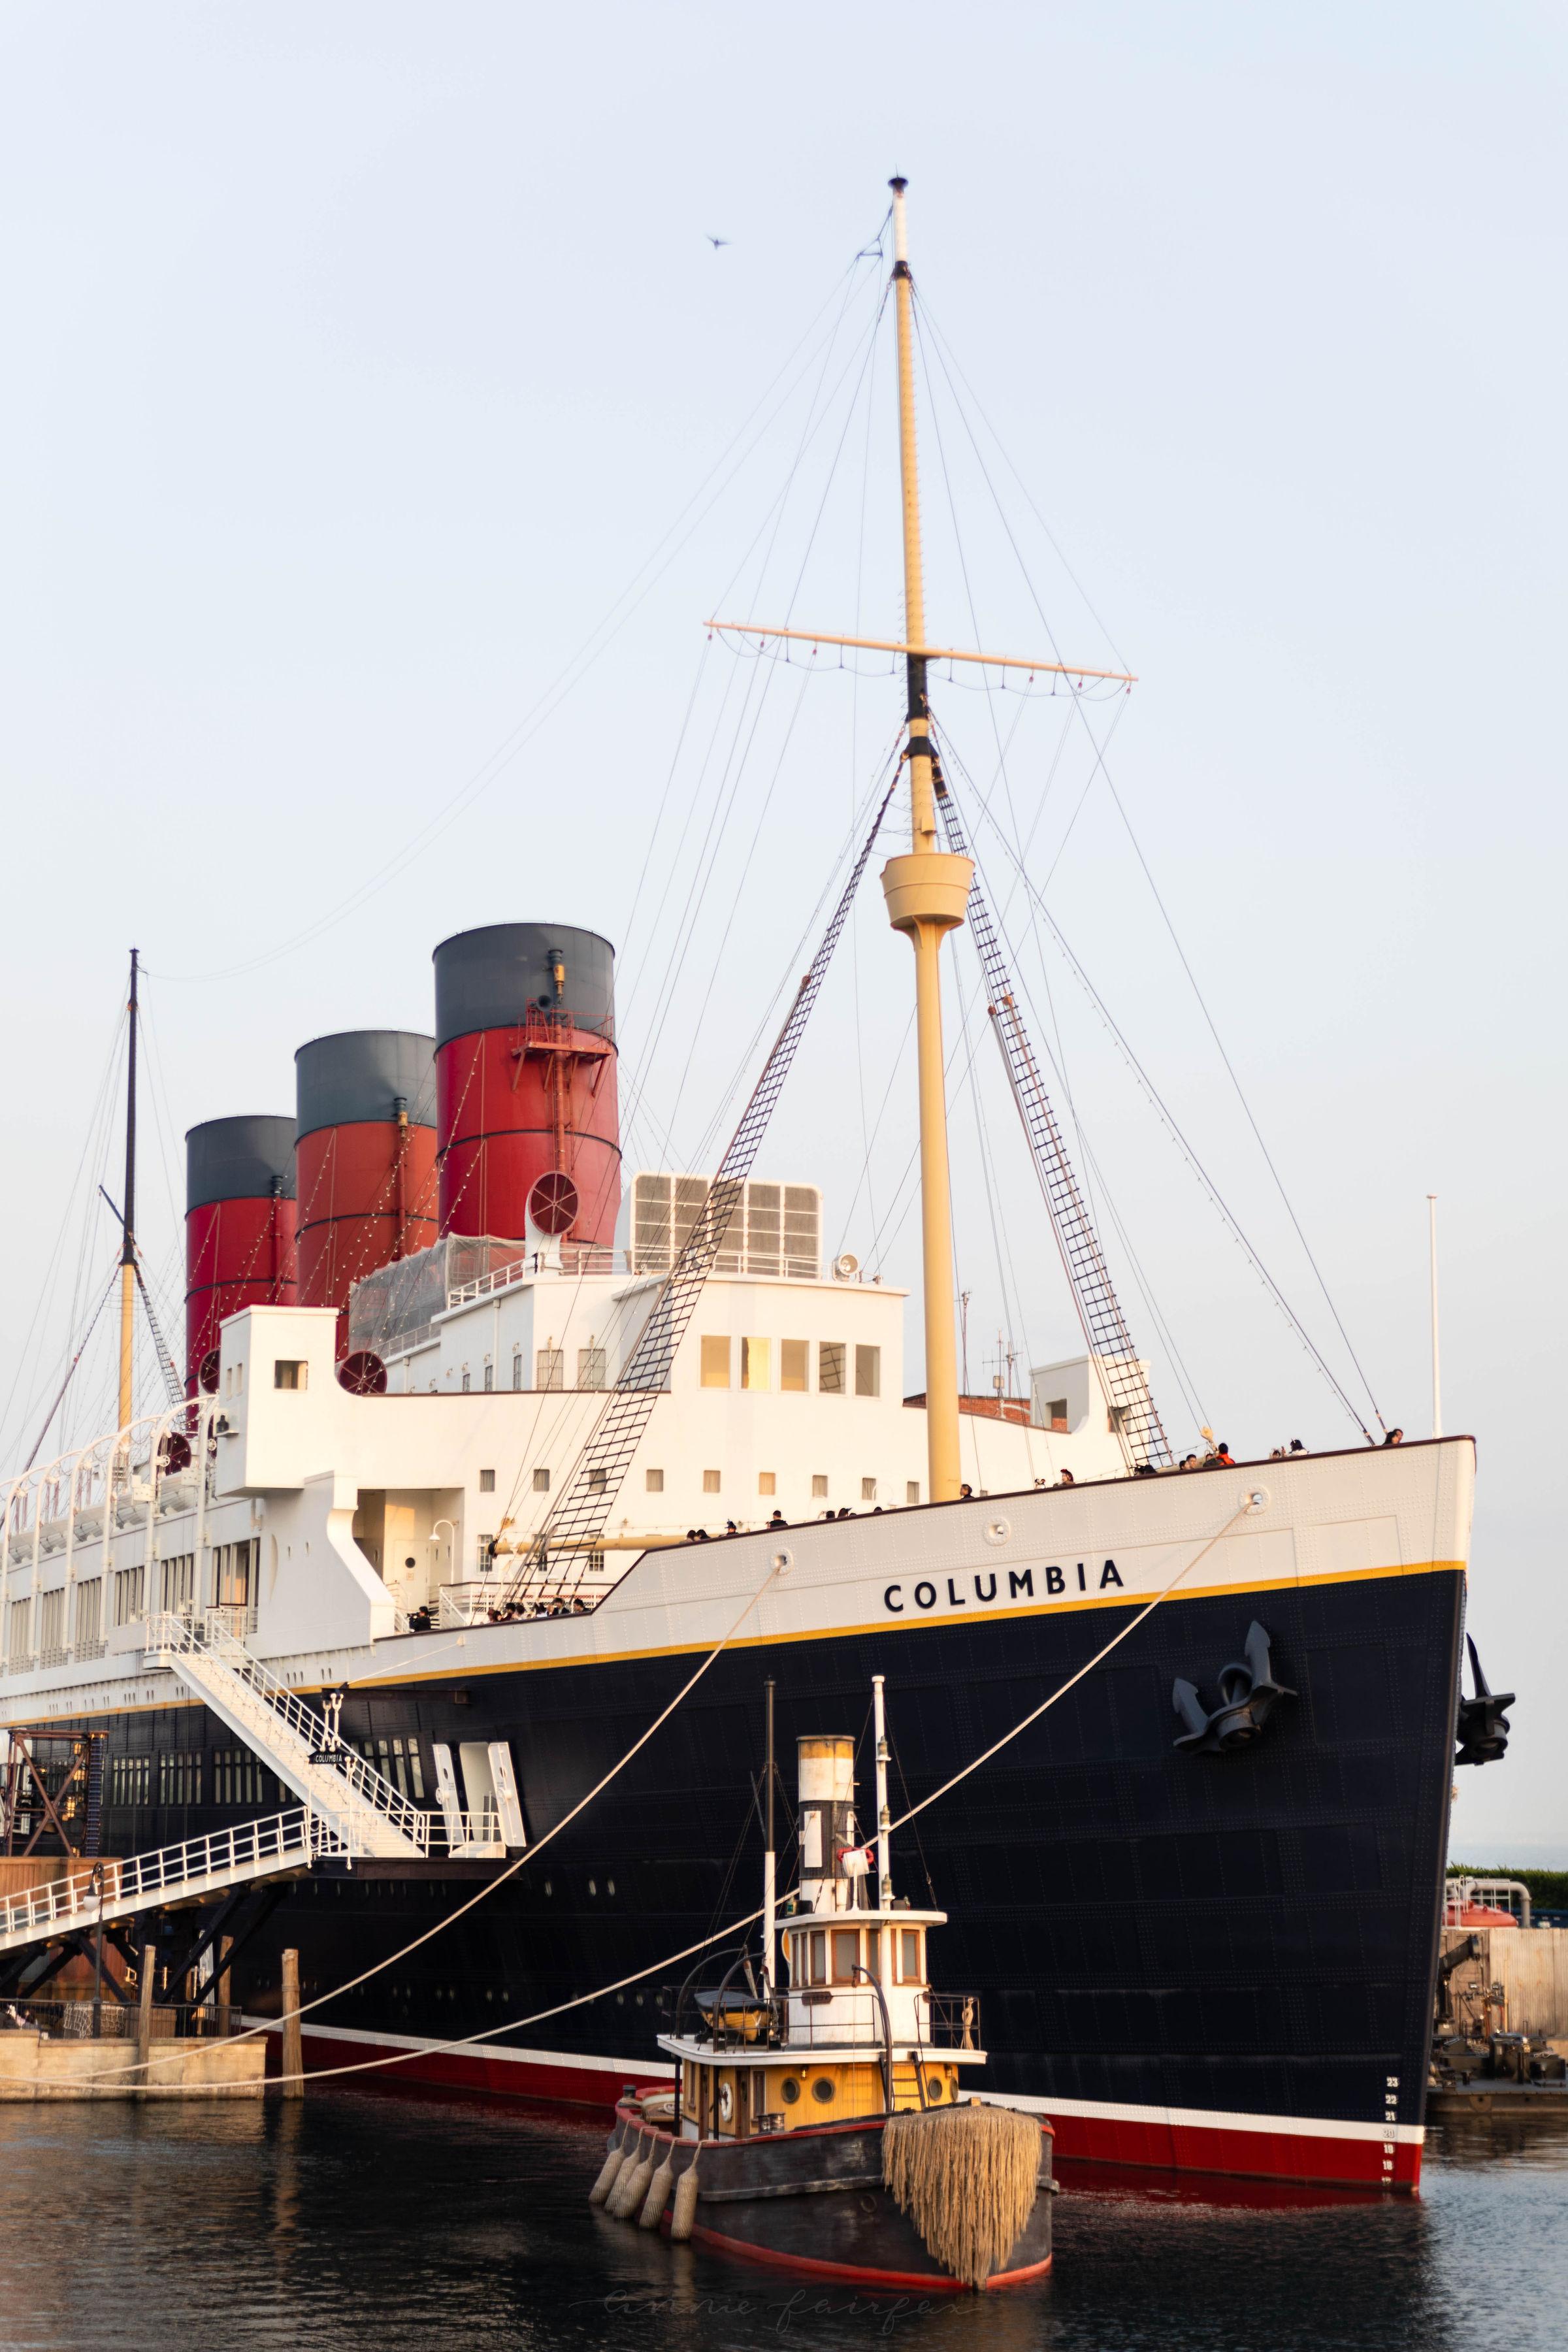 The Columbia Ship at American Harbor in American Waterfront at Tokyo DisneySea